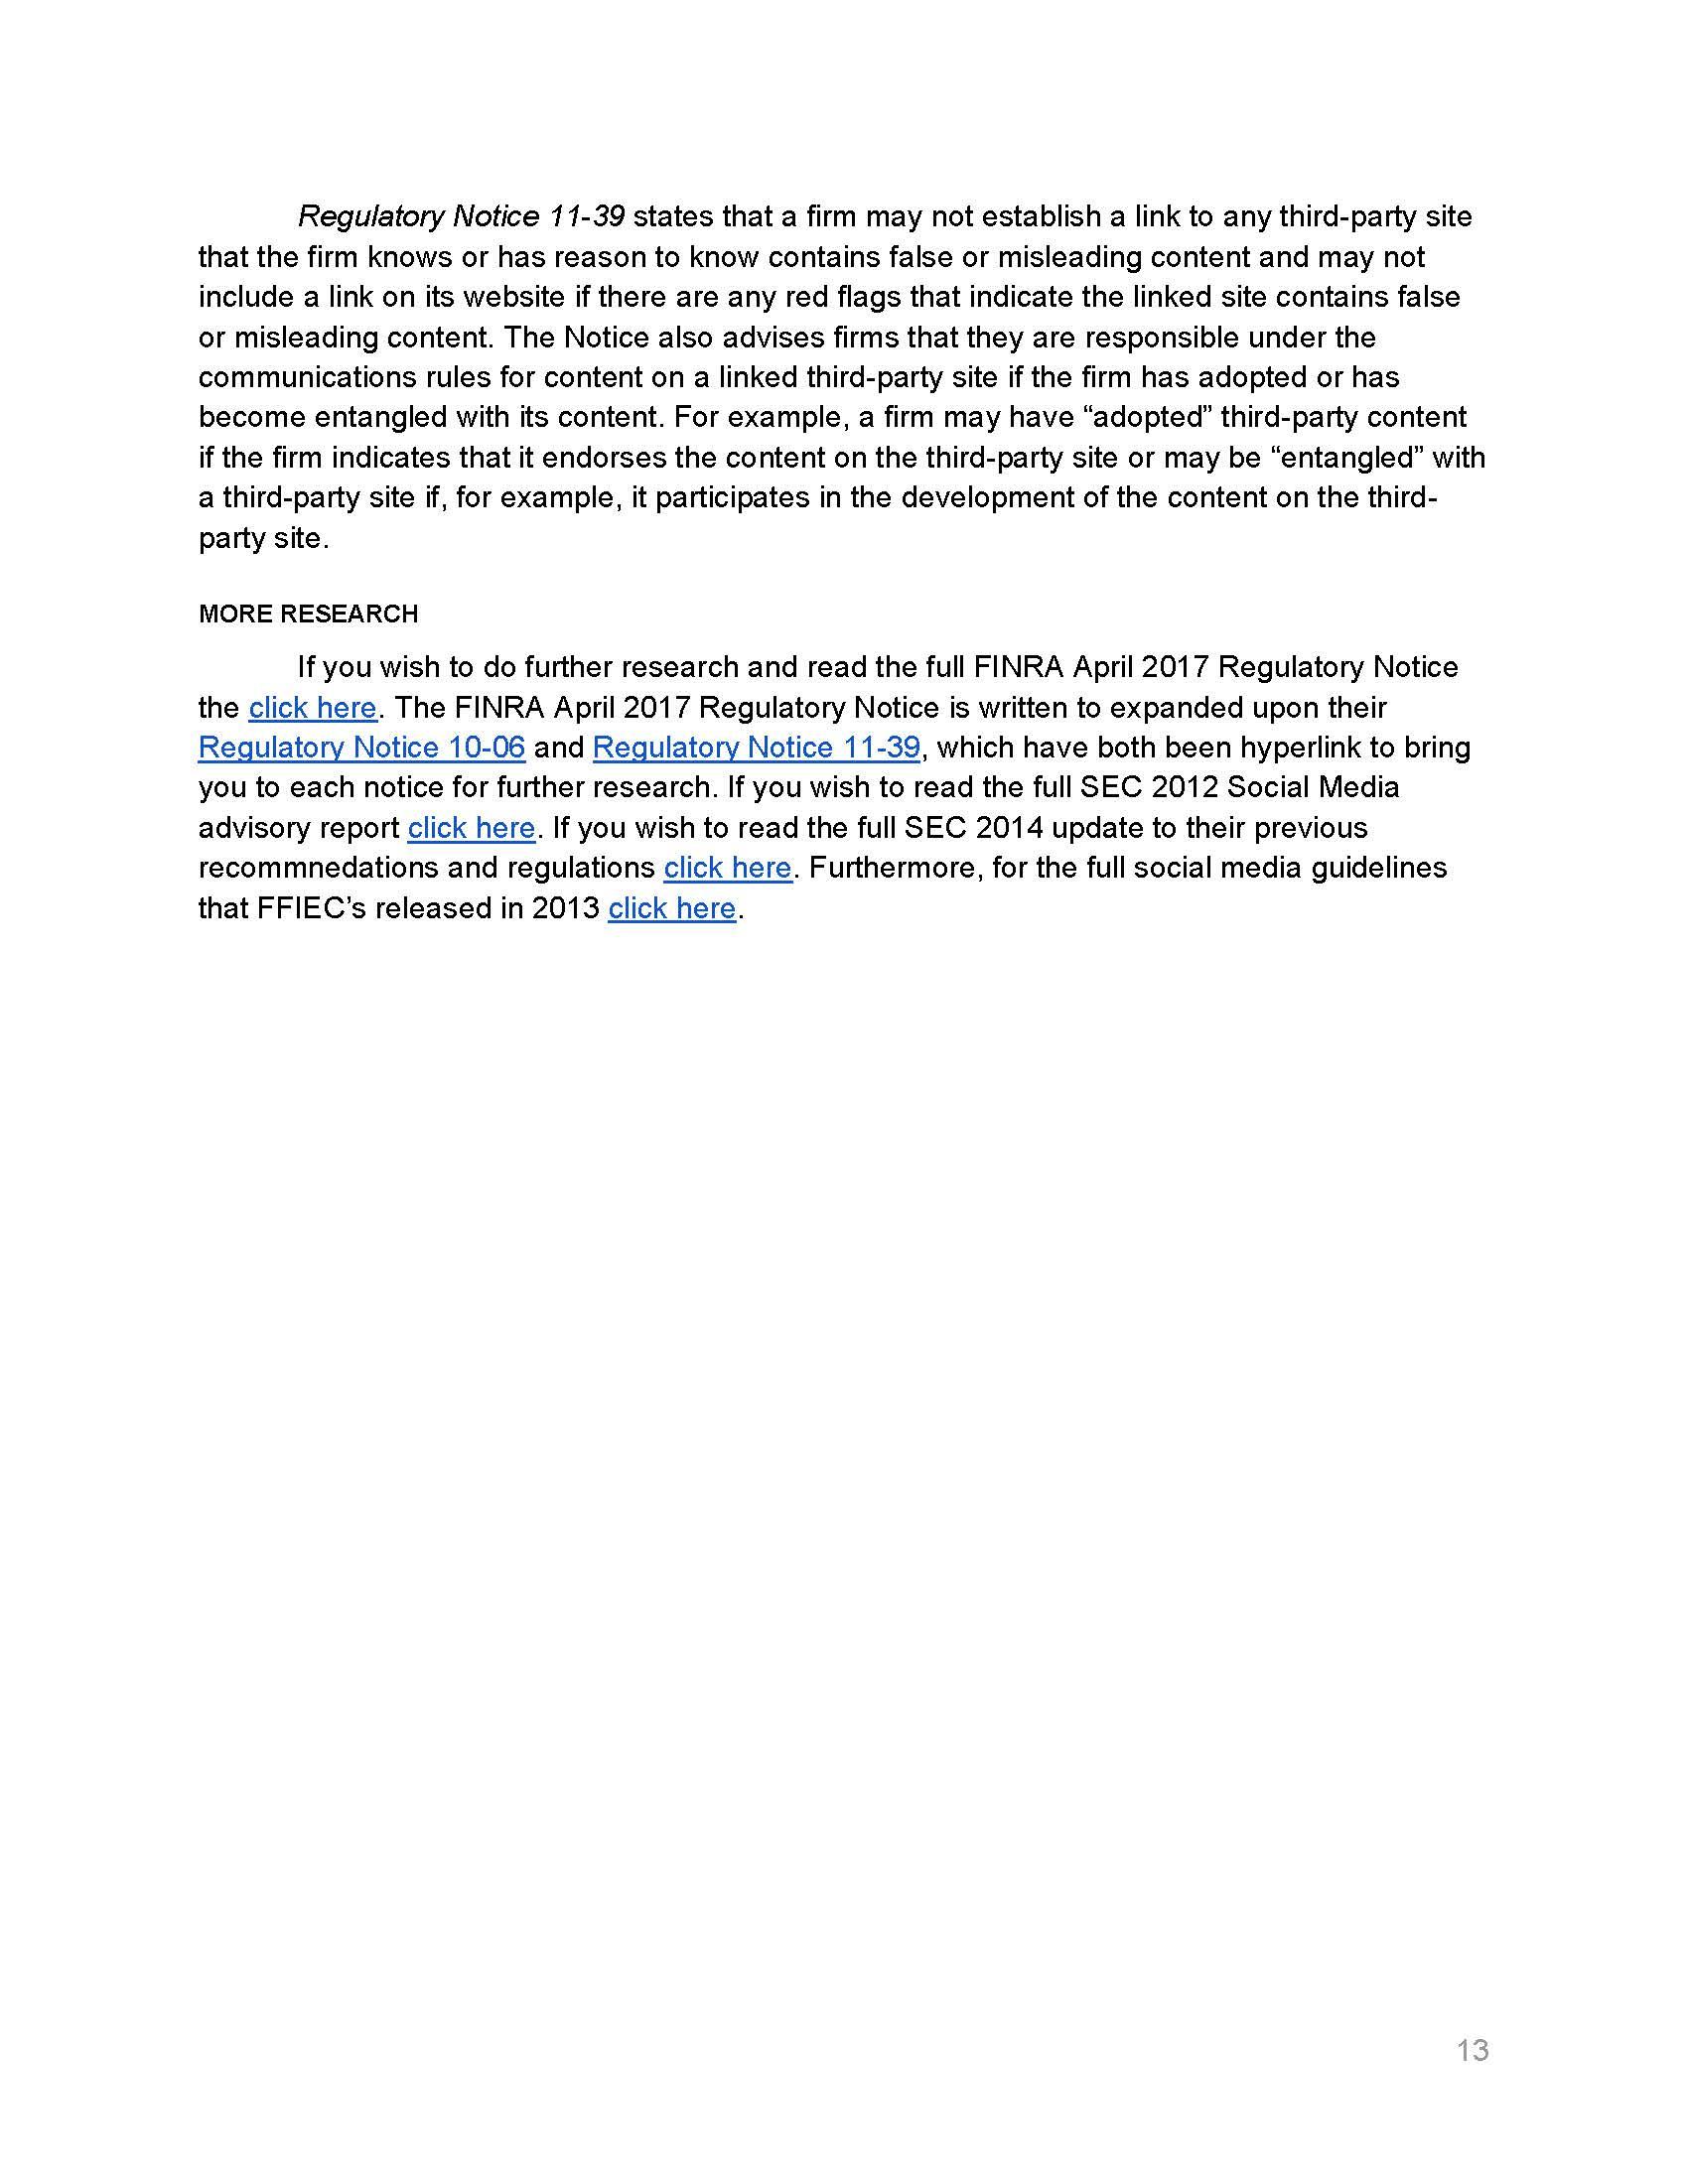 Amity Financial - Social Media White Paper_Page_14.jpg